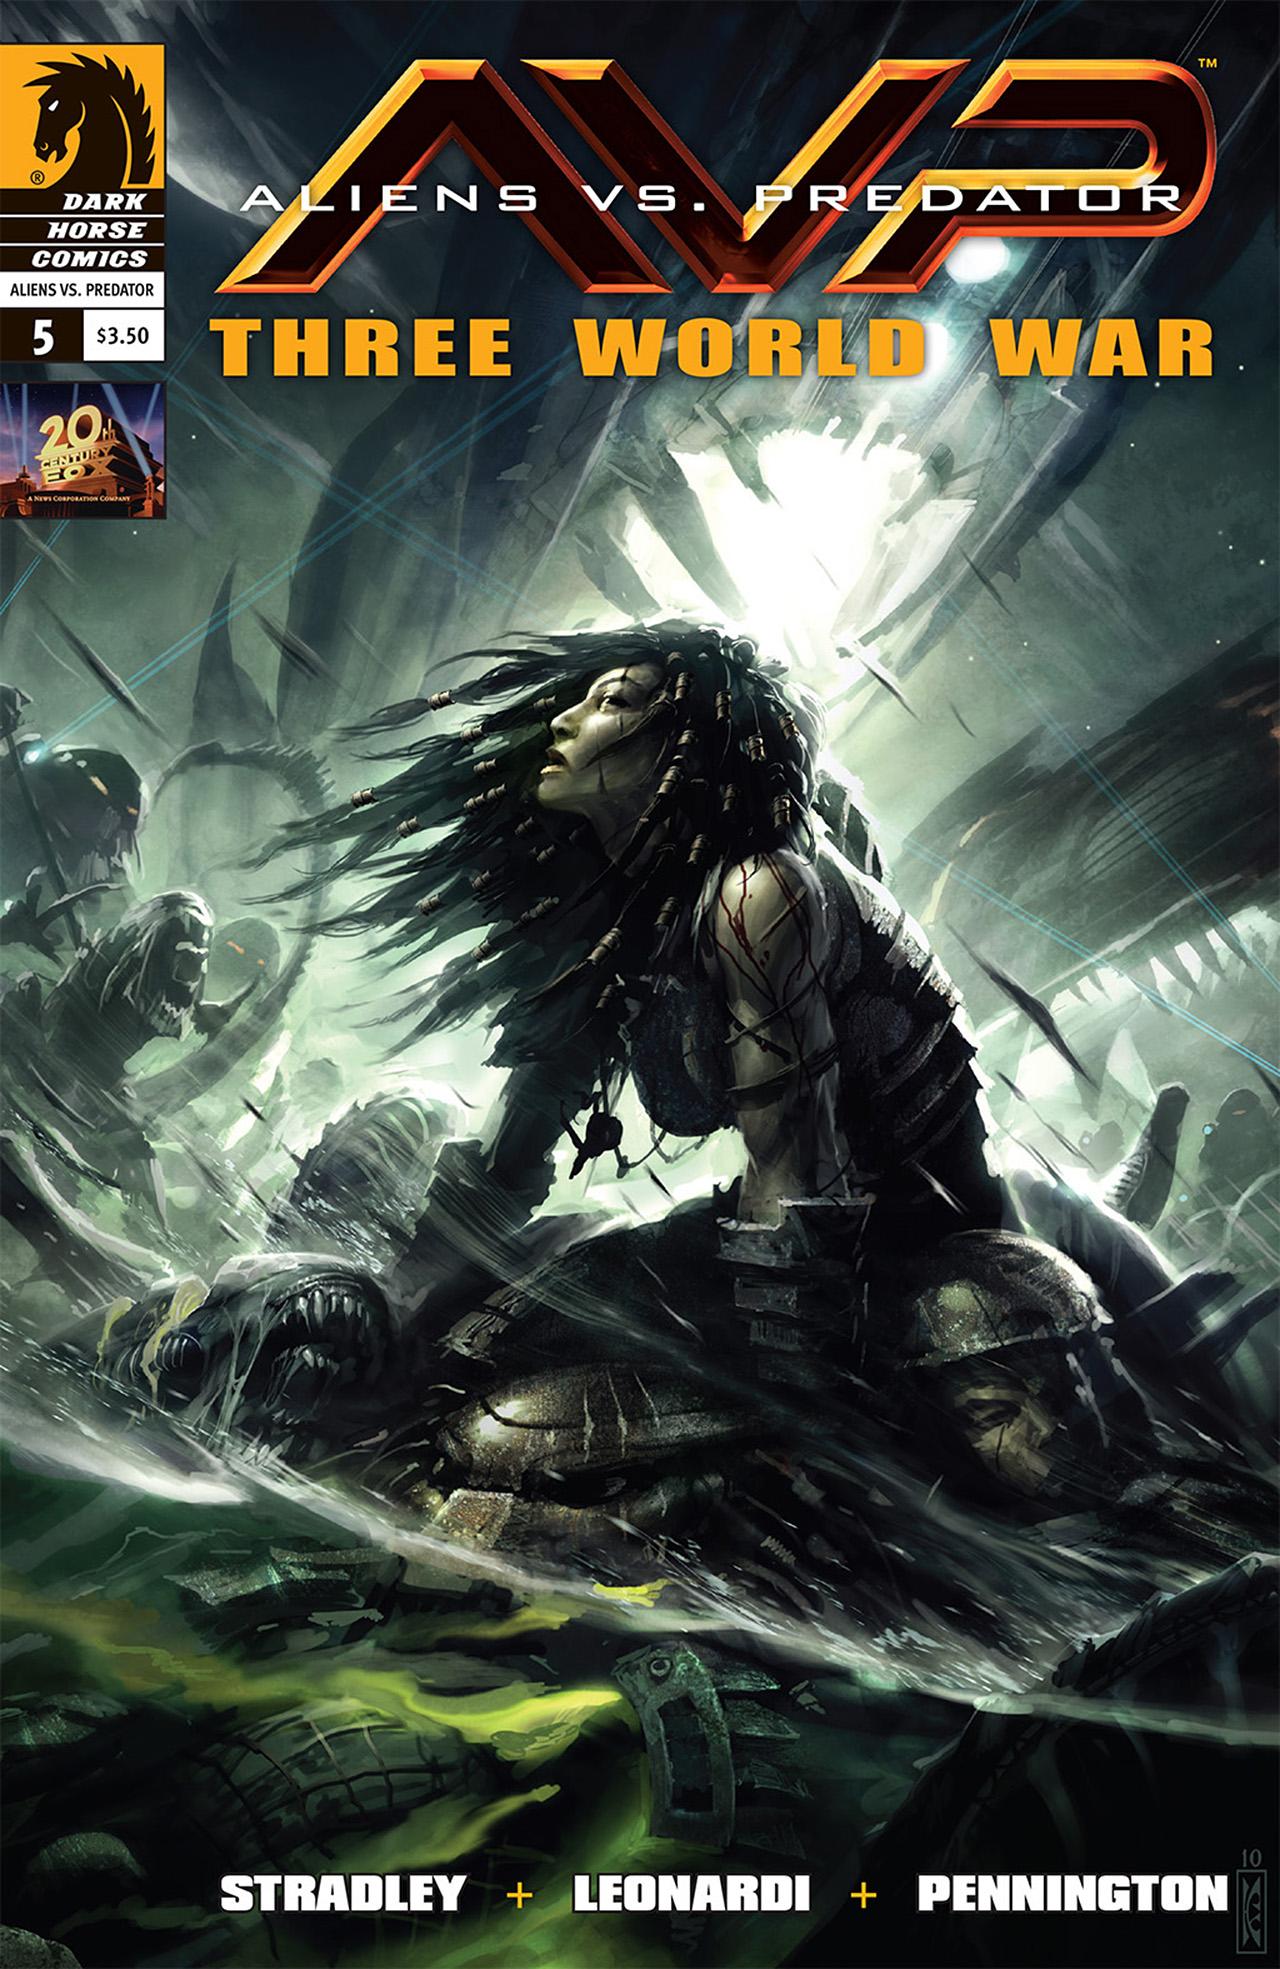 Aliens vs. Predator: Three World War 5 Page 1